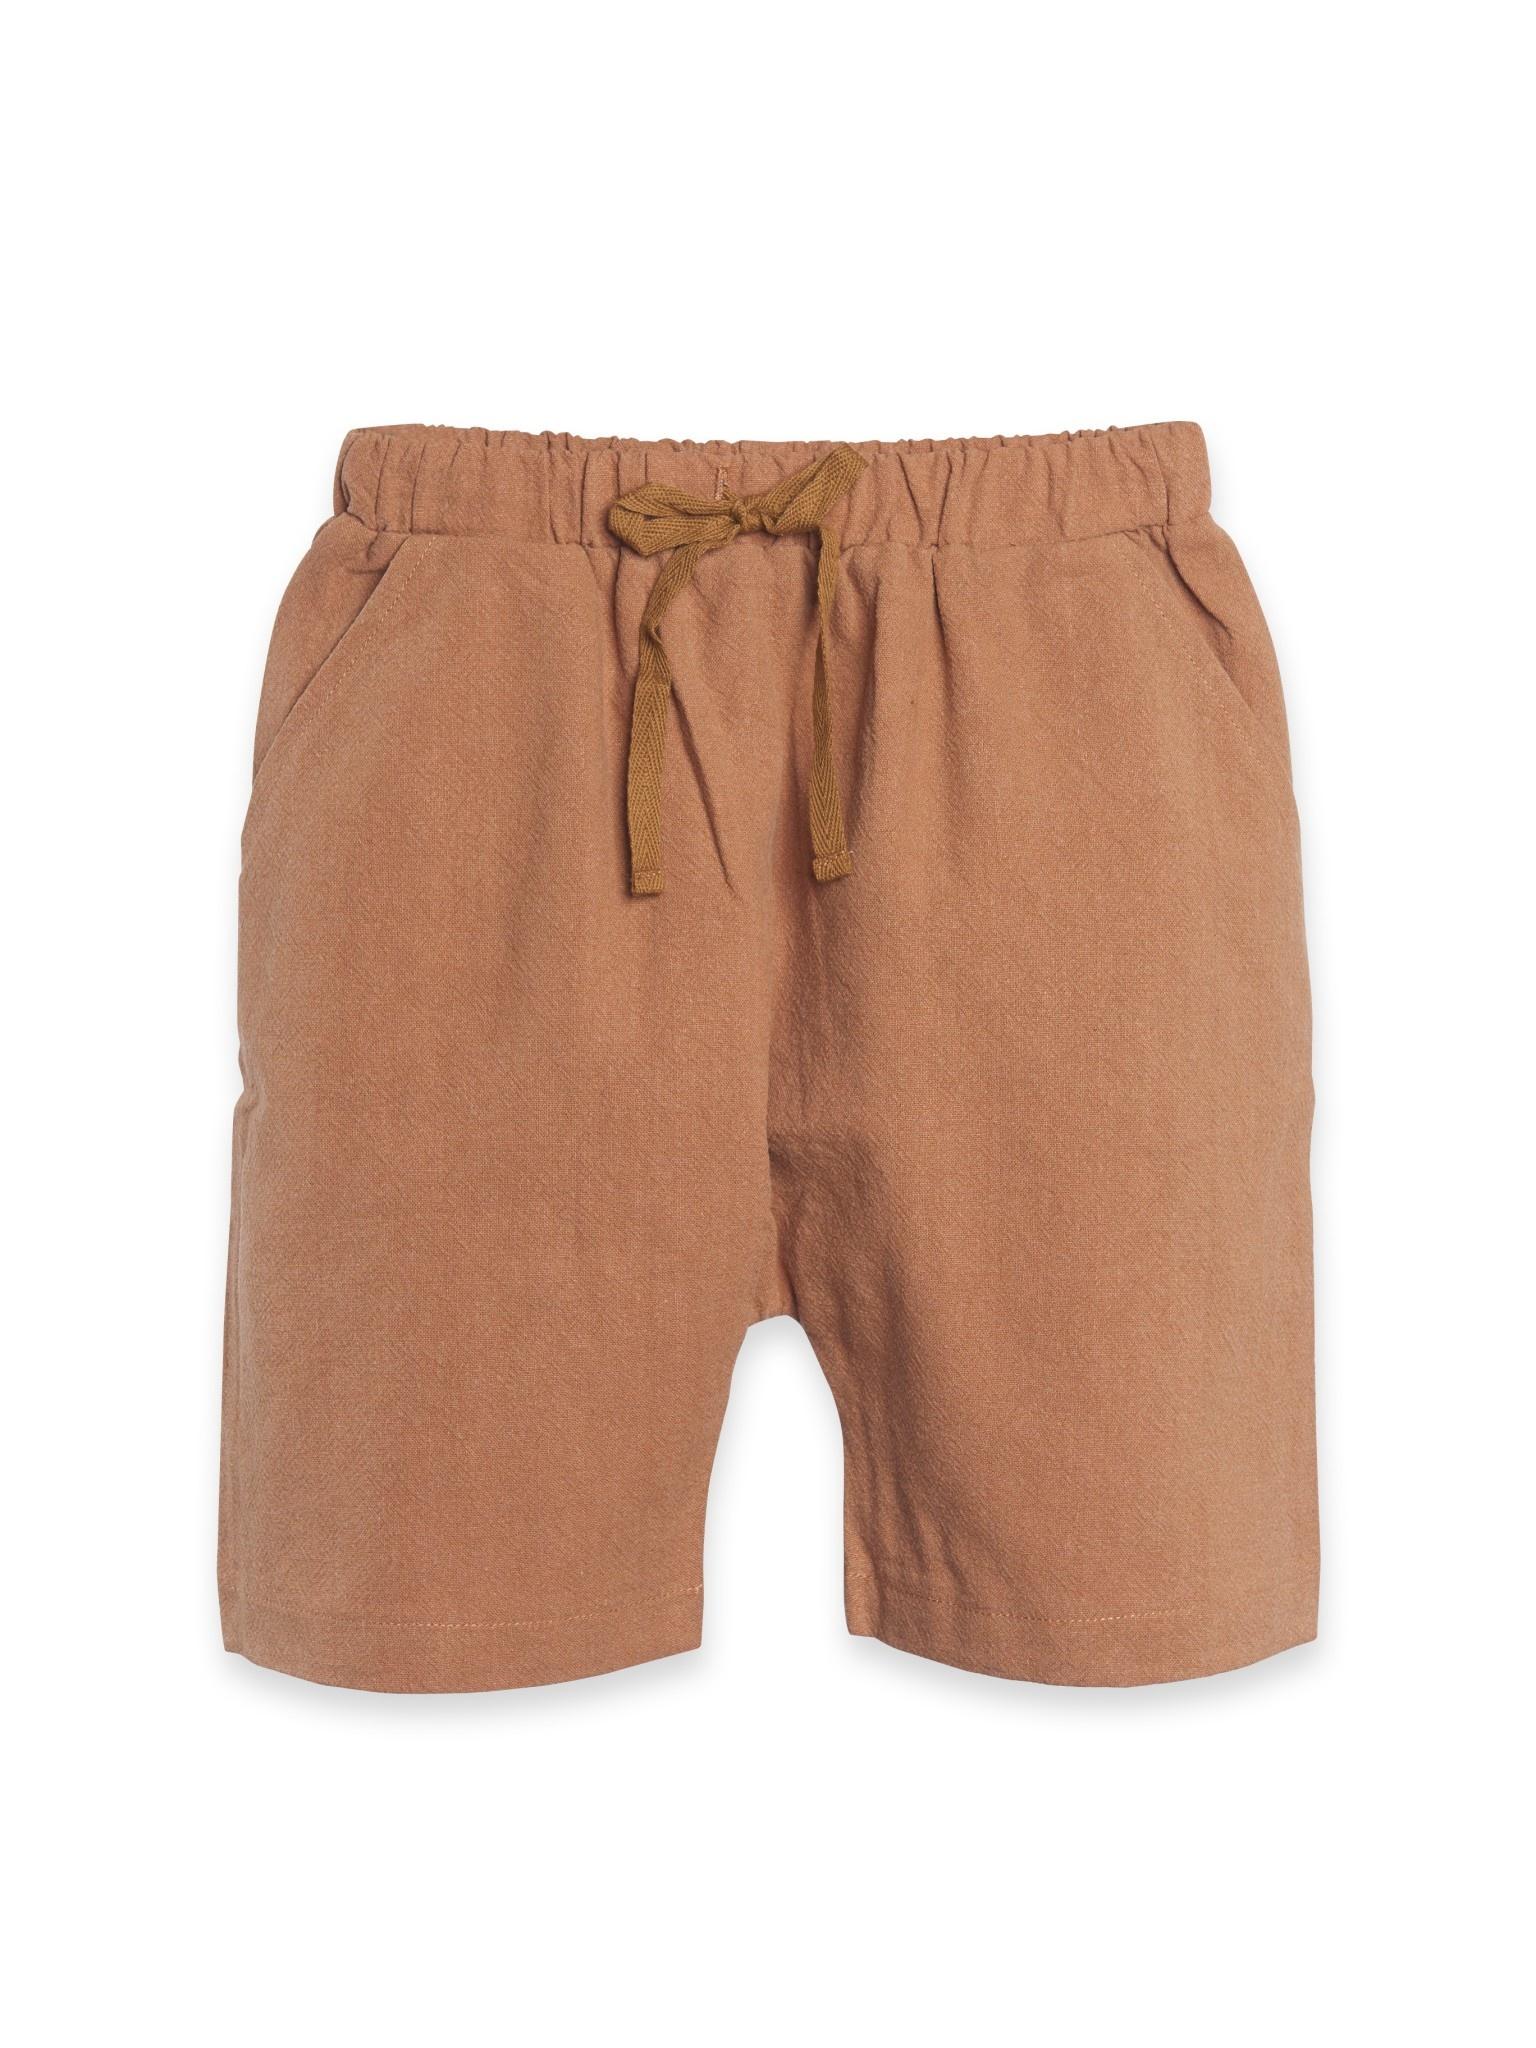 Siaomimi Cinnamon Shorts